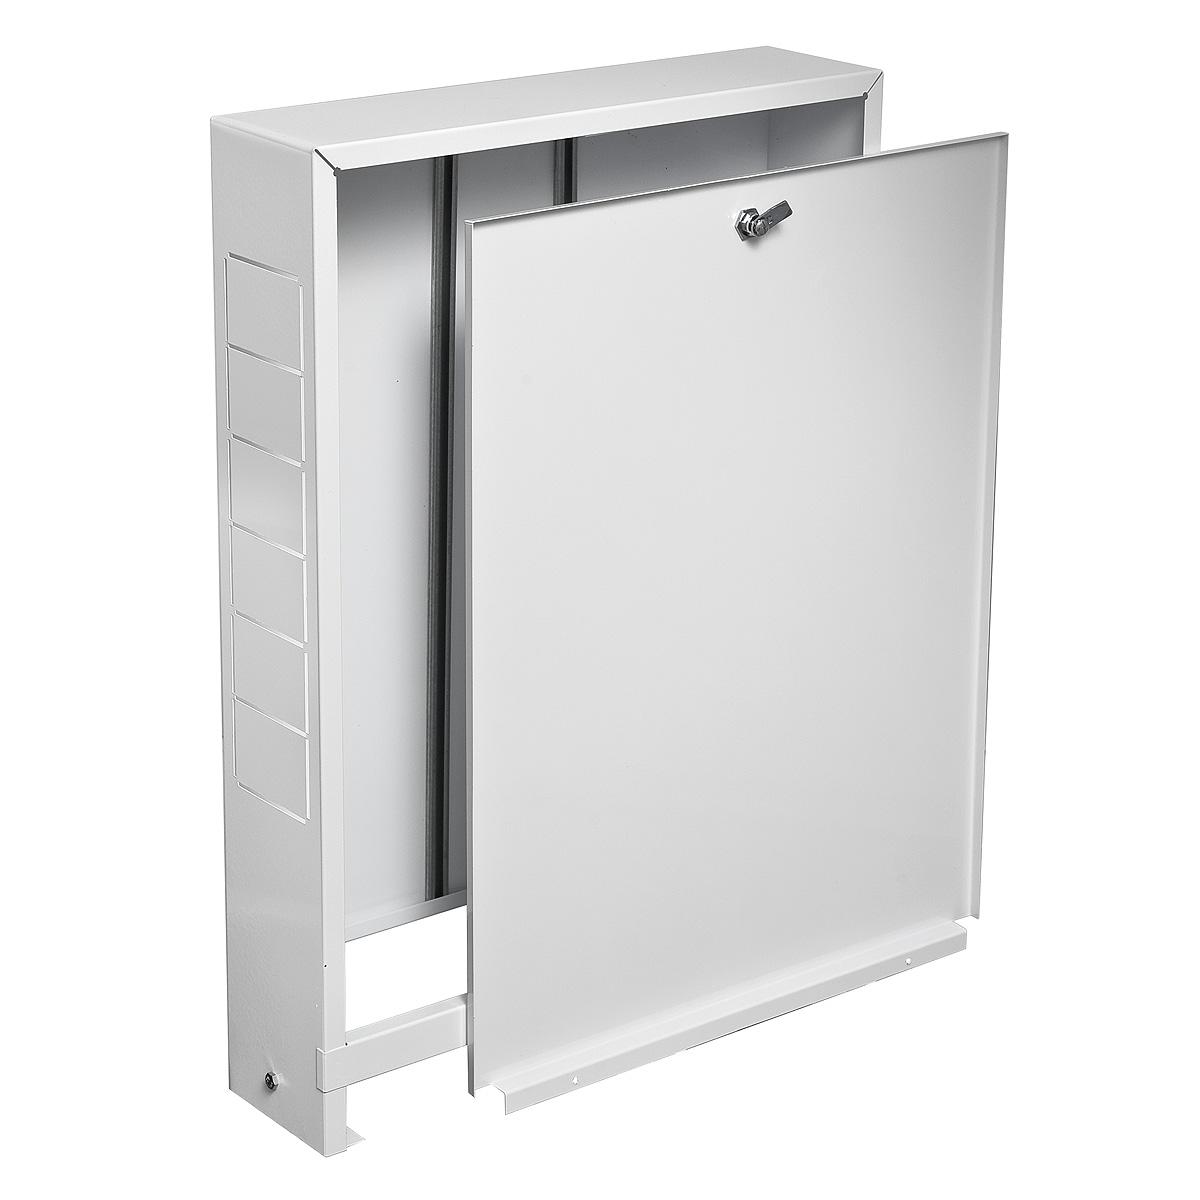 Коллекторный шкаф Stout ШРН 1 (SCC 0001